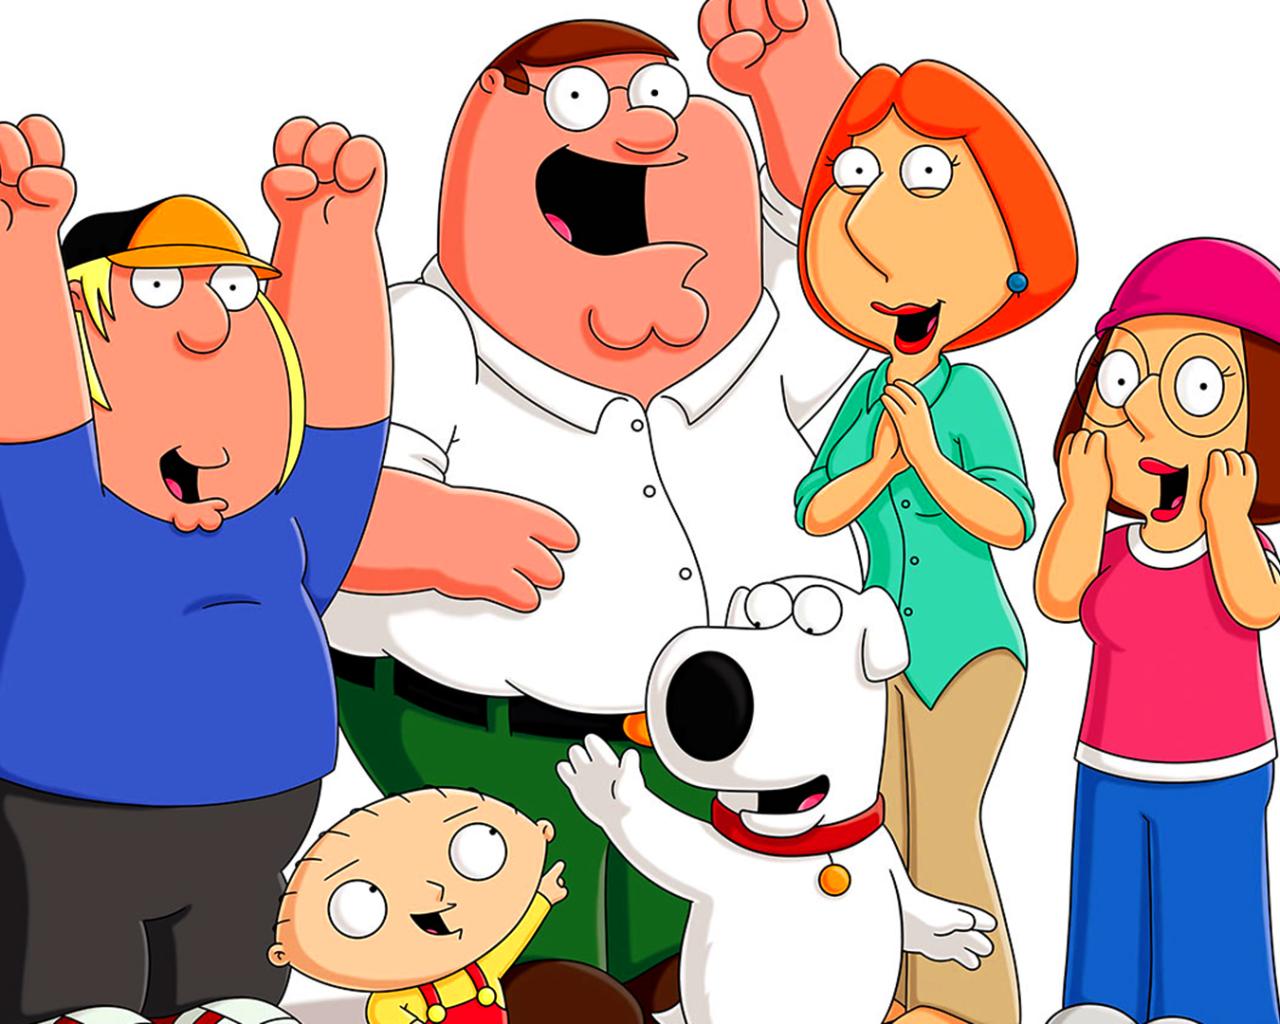 Family Guy Fox Cartoons Wallpaper 42669526 Fanpop